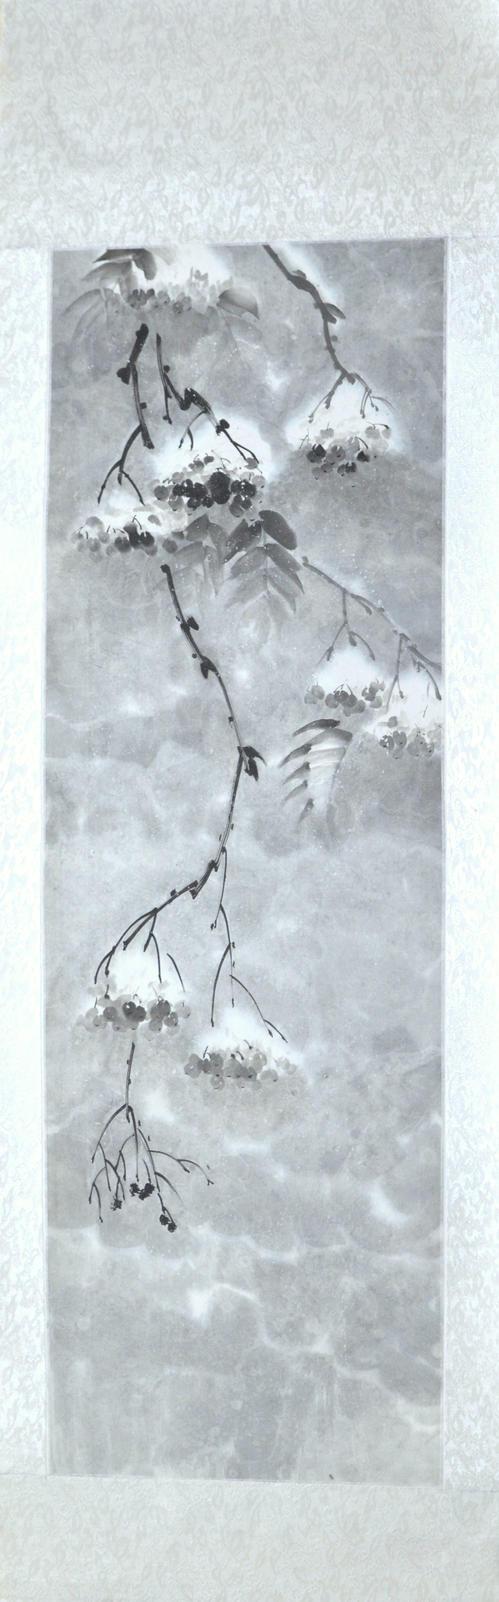 Sumie Rowan under snow, silk scroll by bsshka